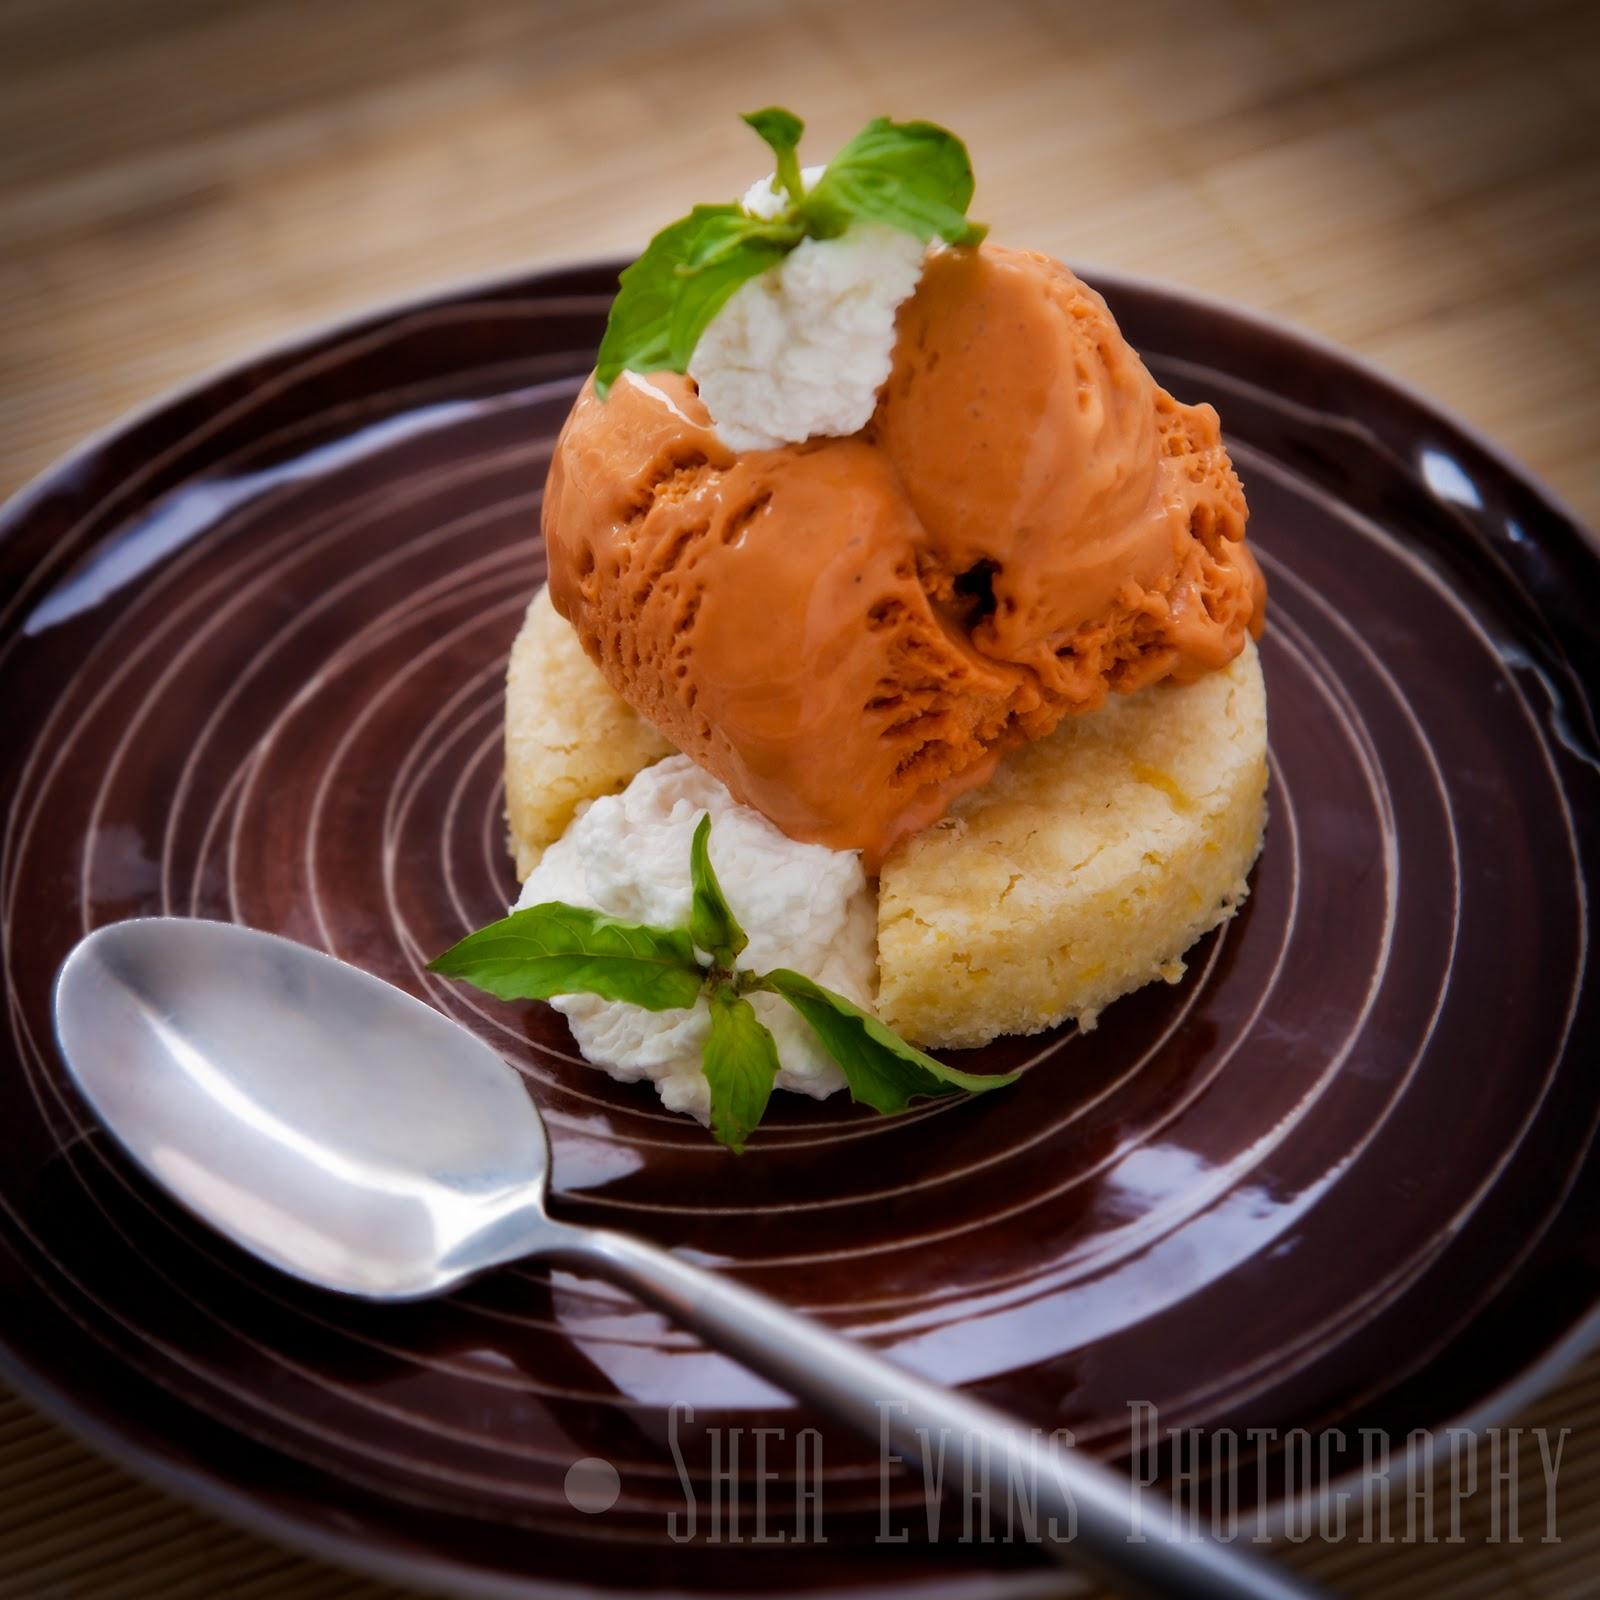 Thai Iced Tea Ice Cream with Lemon Blondies and Basil ...